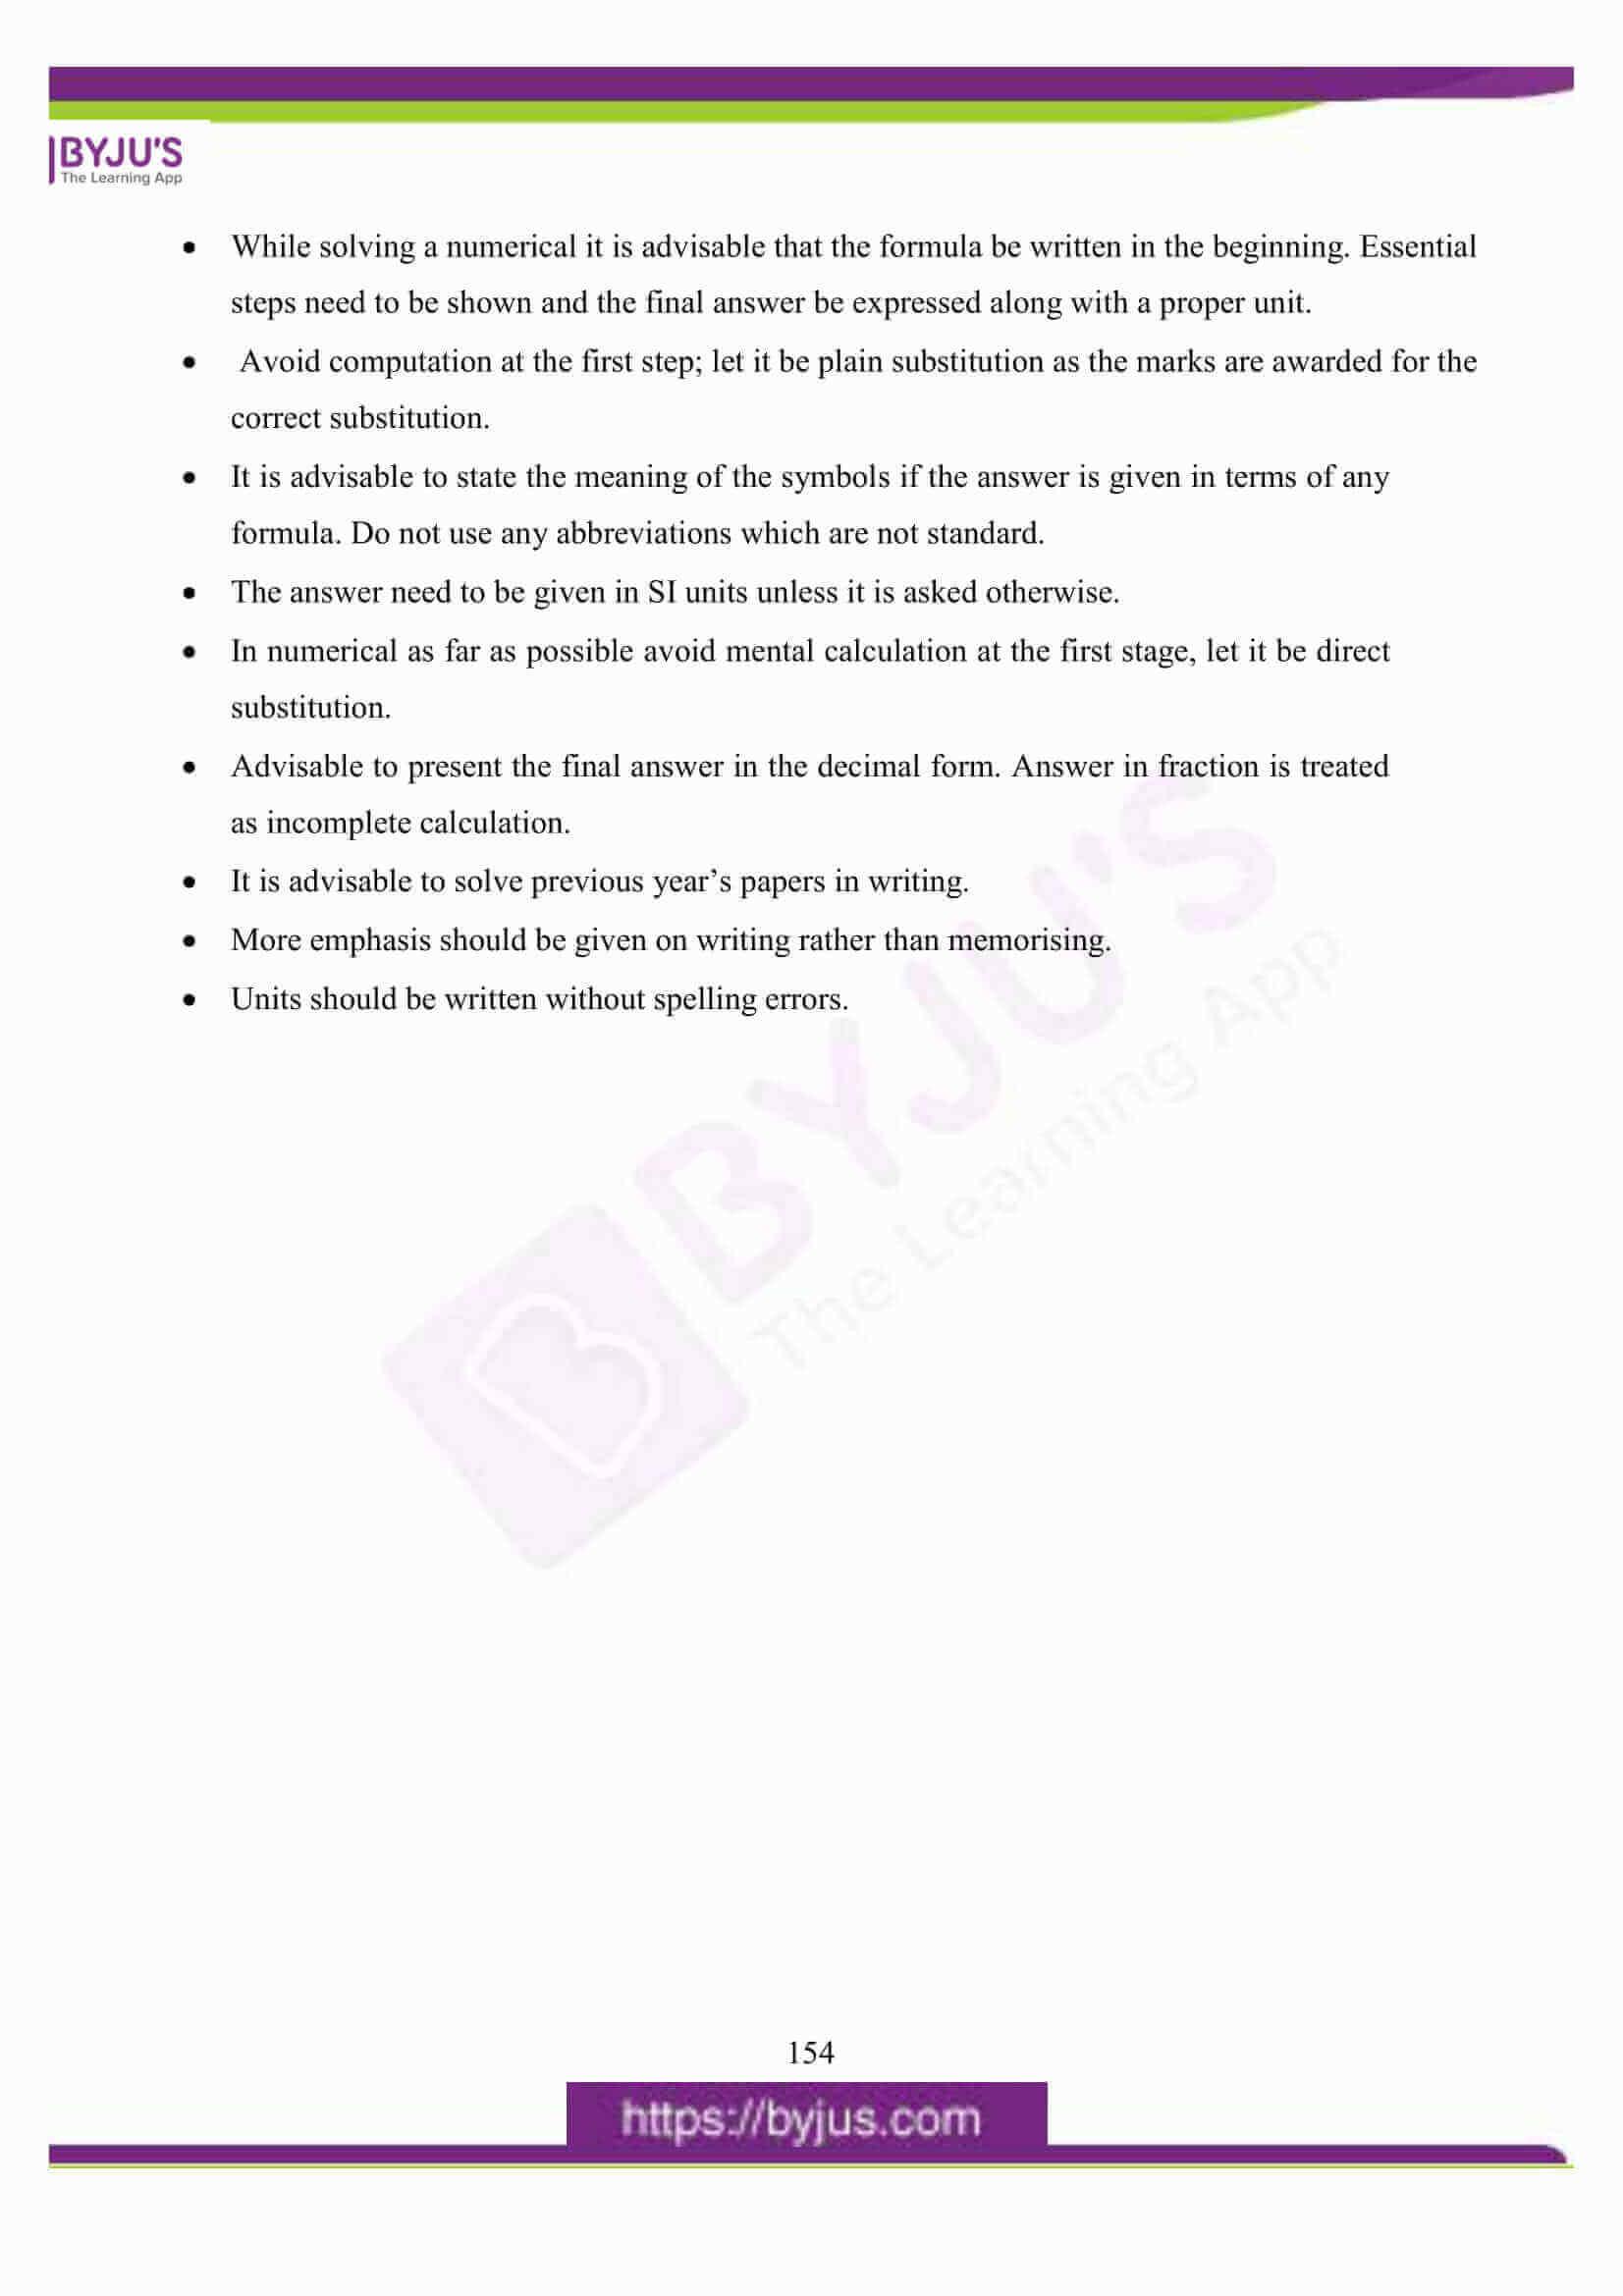 icse class 10 physics question paper solution 2016 19